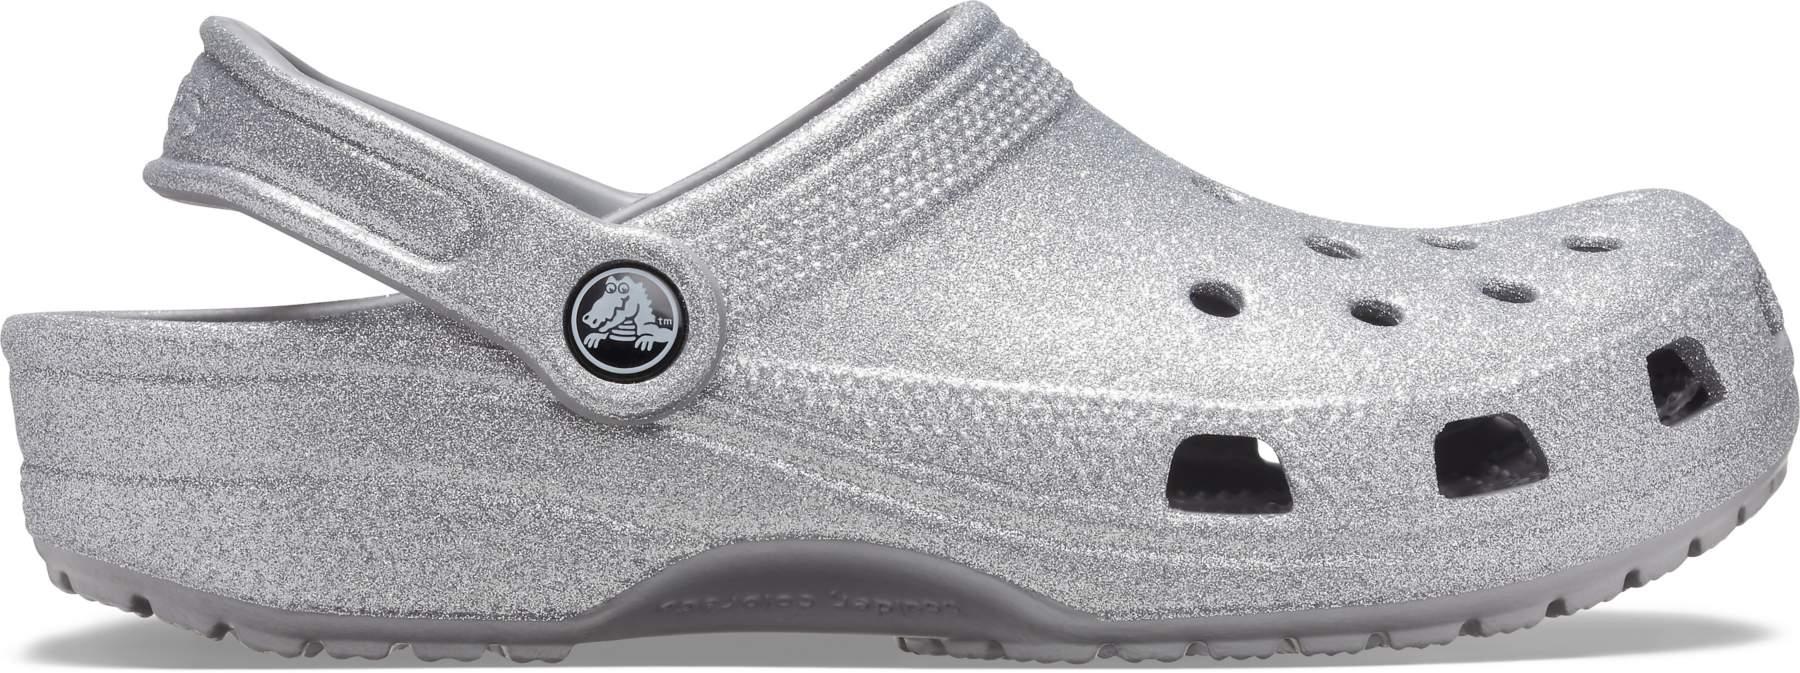 Crocs™ Classic Glitter Clog Silver 36,5